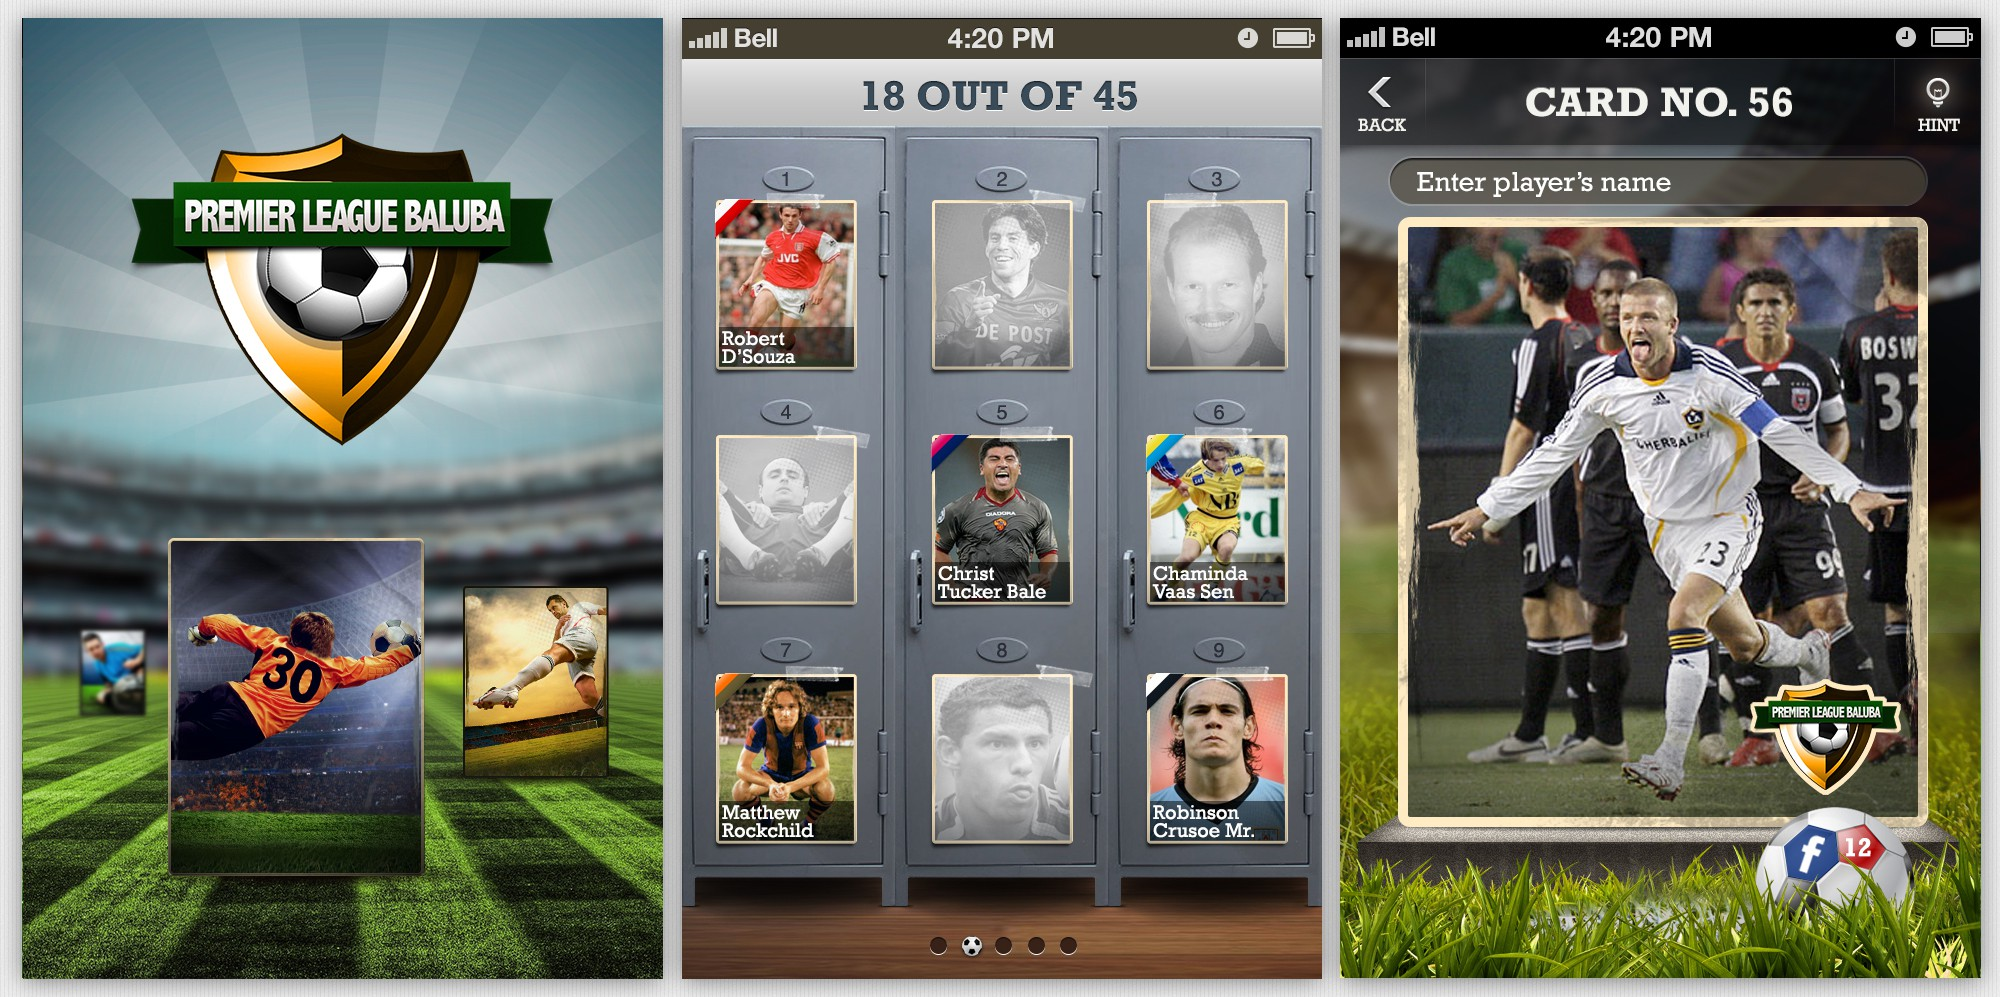 Football (Soccer) Cards Mobile Game